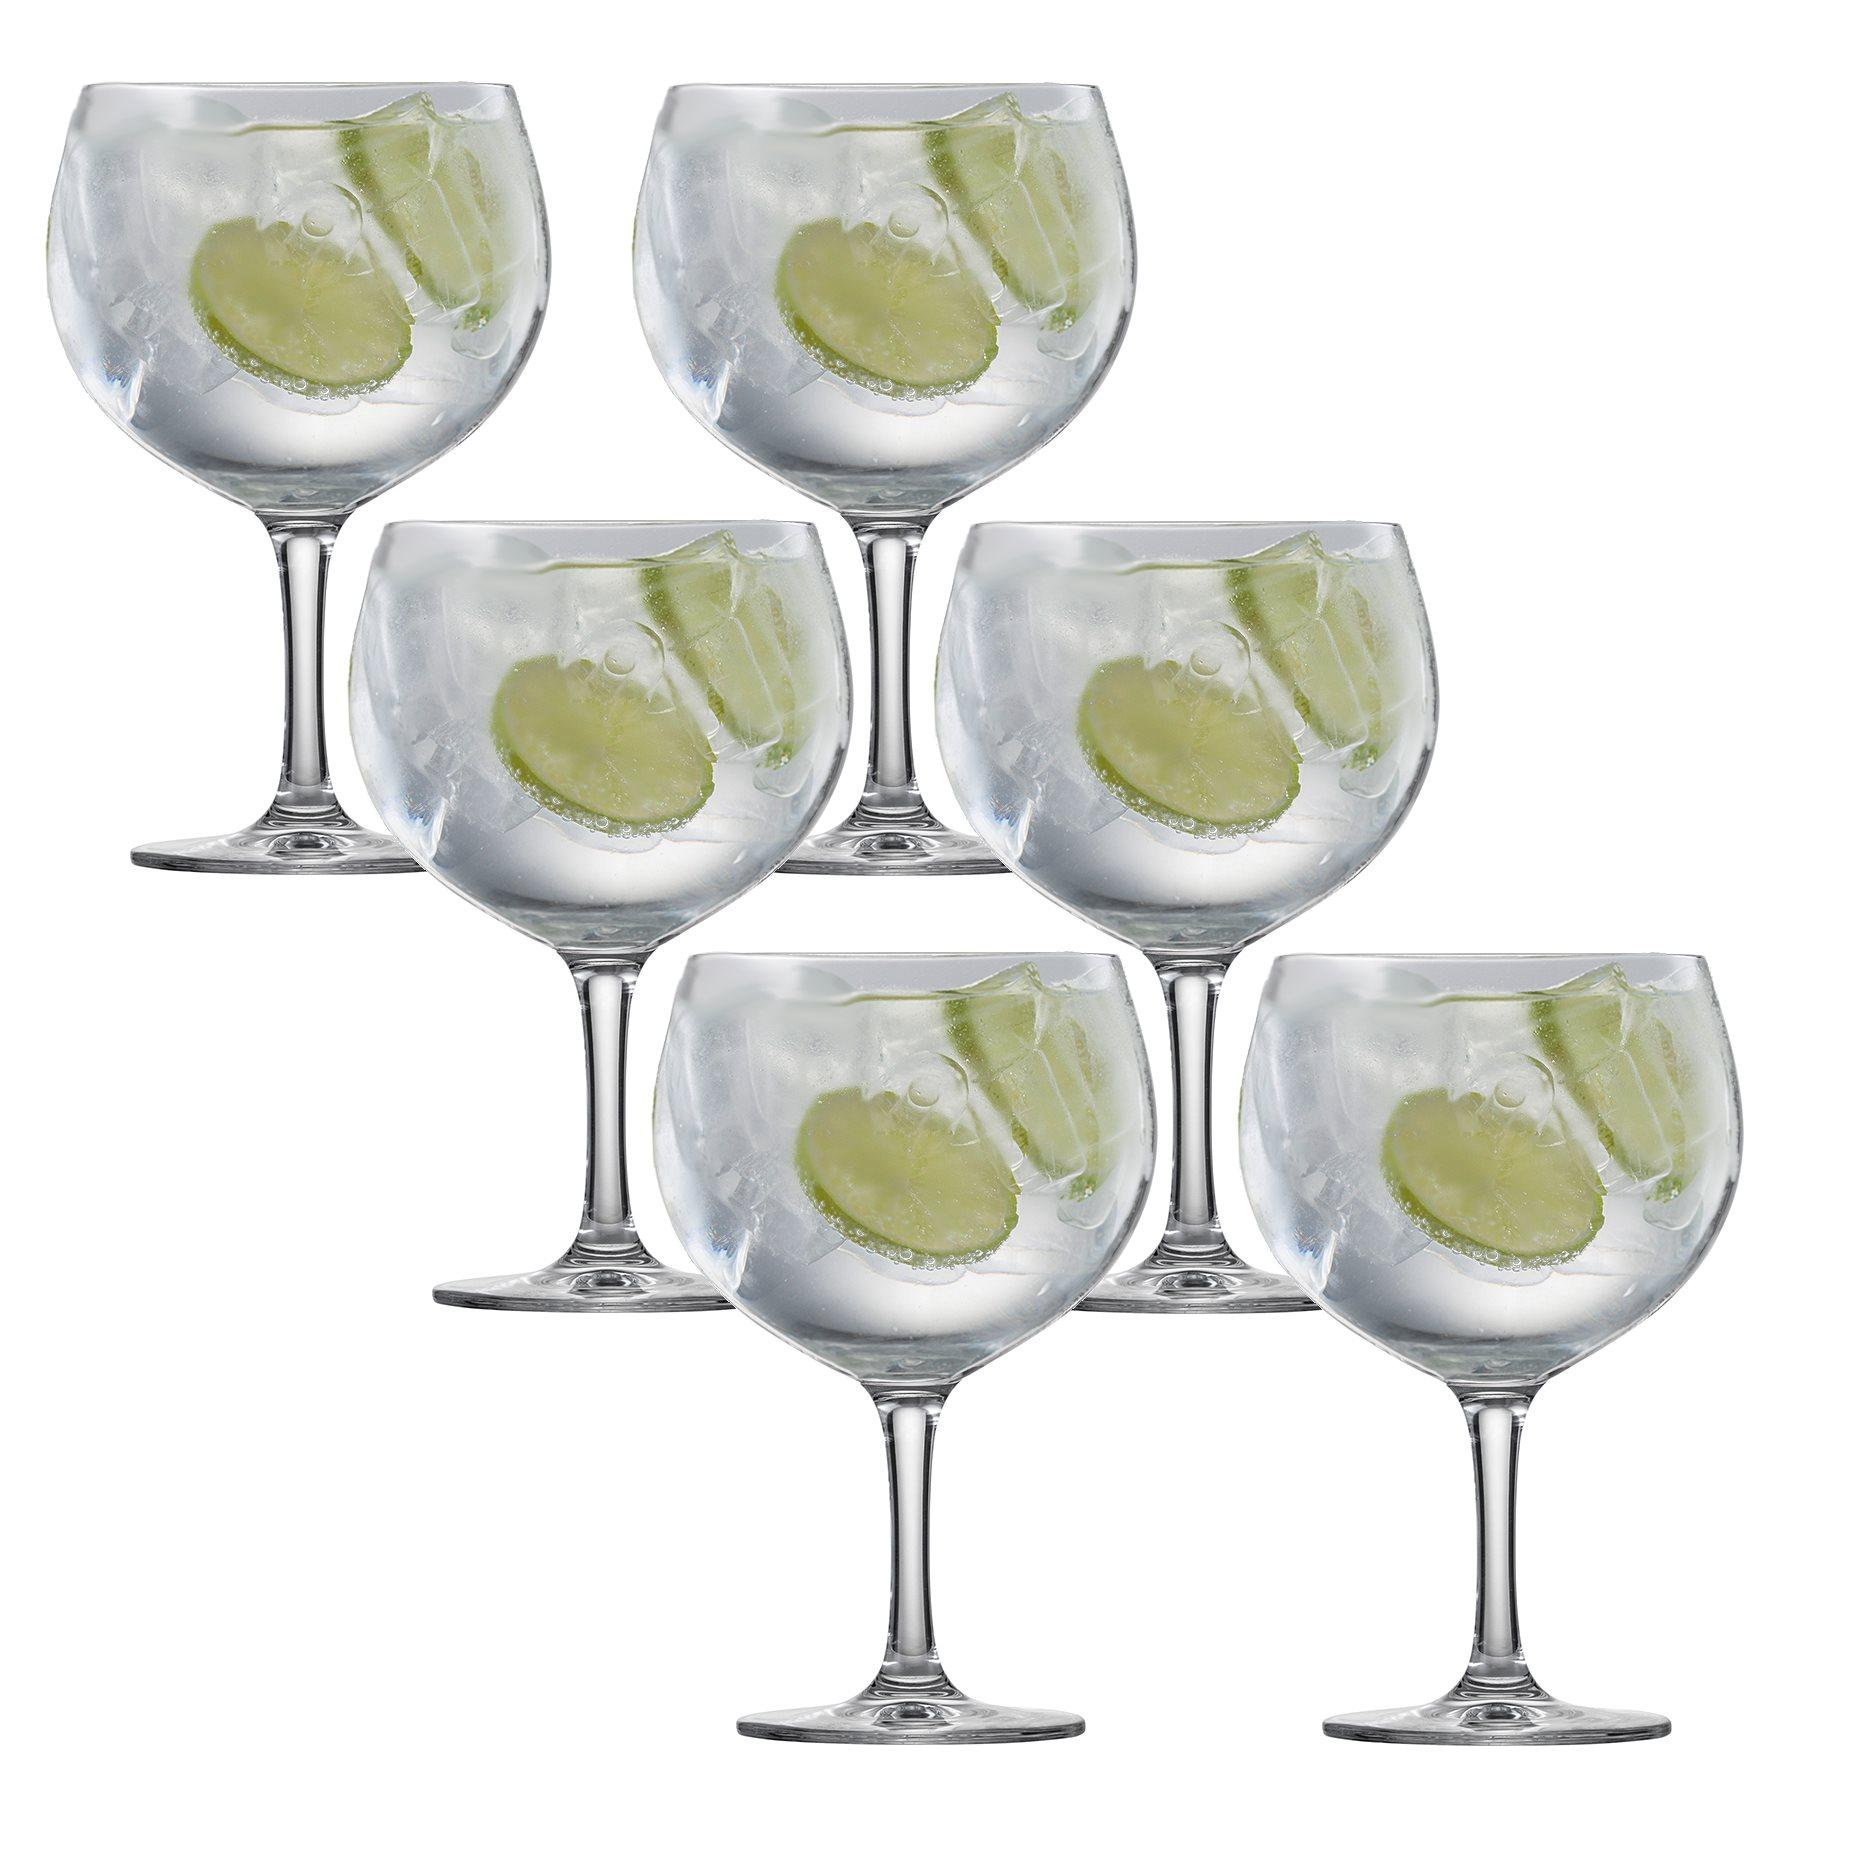 schott zwiesel serie bar special gin tonic glas 6 st ck inhalt 710 ml cocktail bargl ser. Black Bedroom Furniture Sets. Home Design Ideas